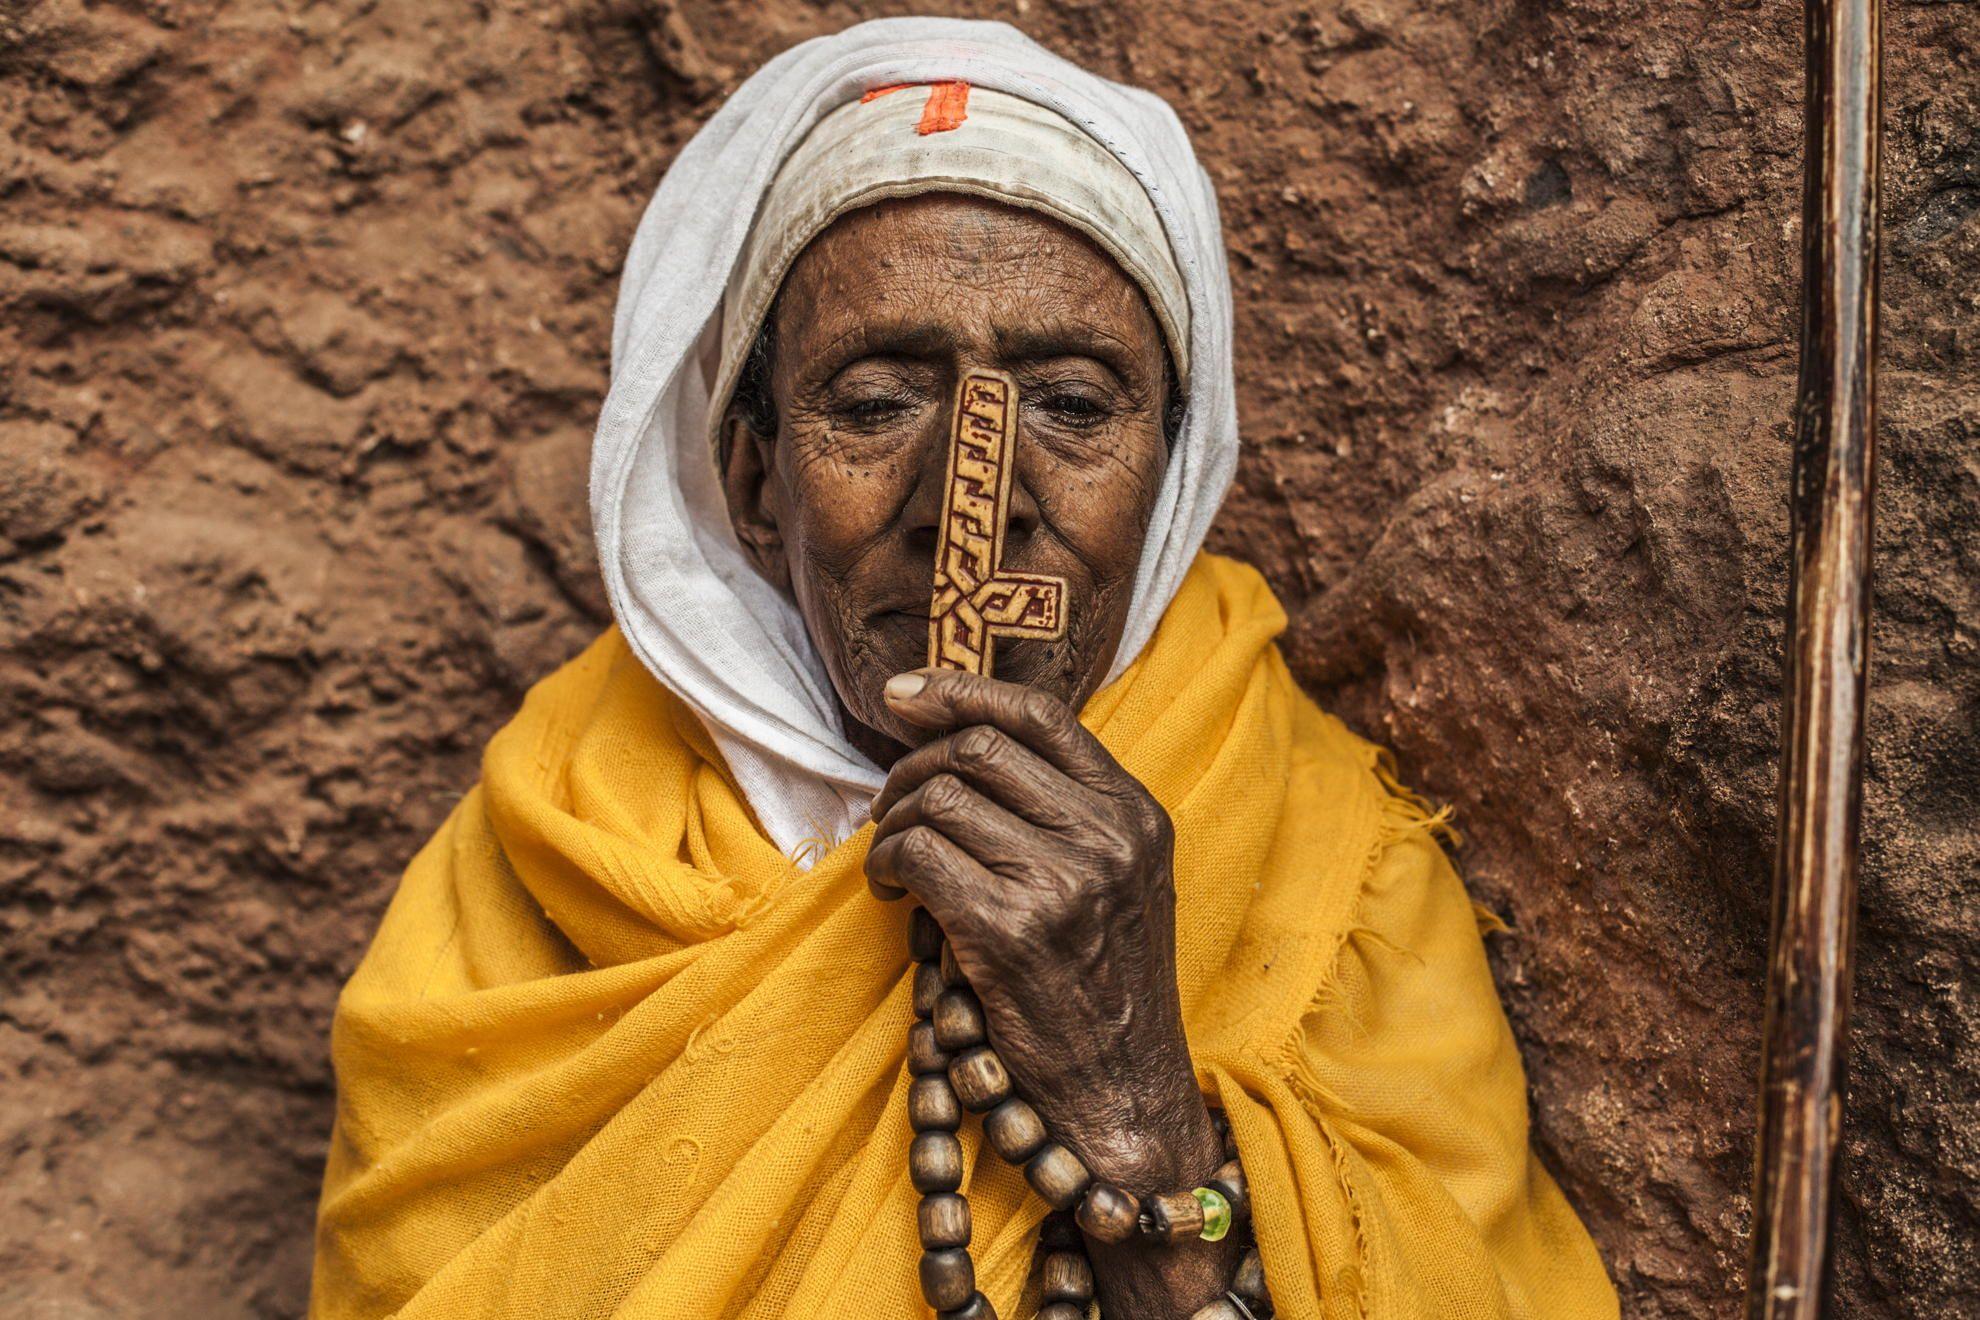 Pin By Mozi Titi On Ethiopia Ethiopian People Ethiopia Eastern Orthodox